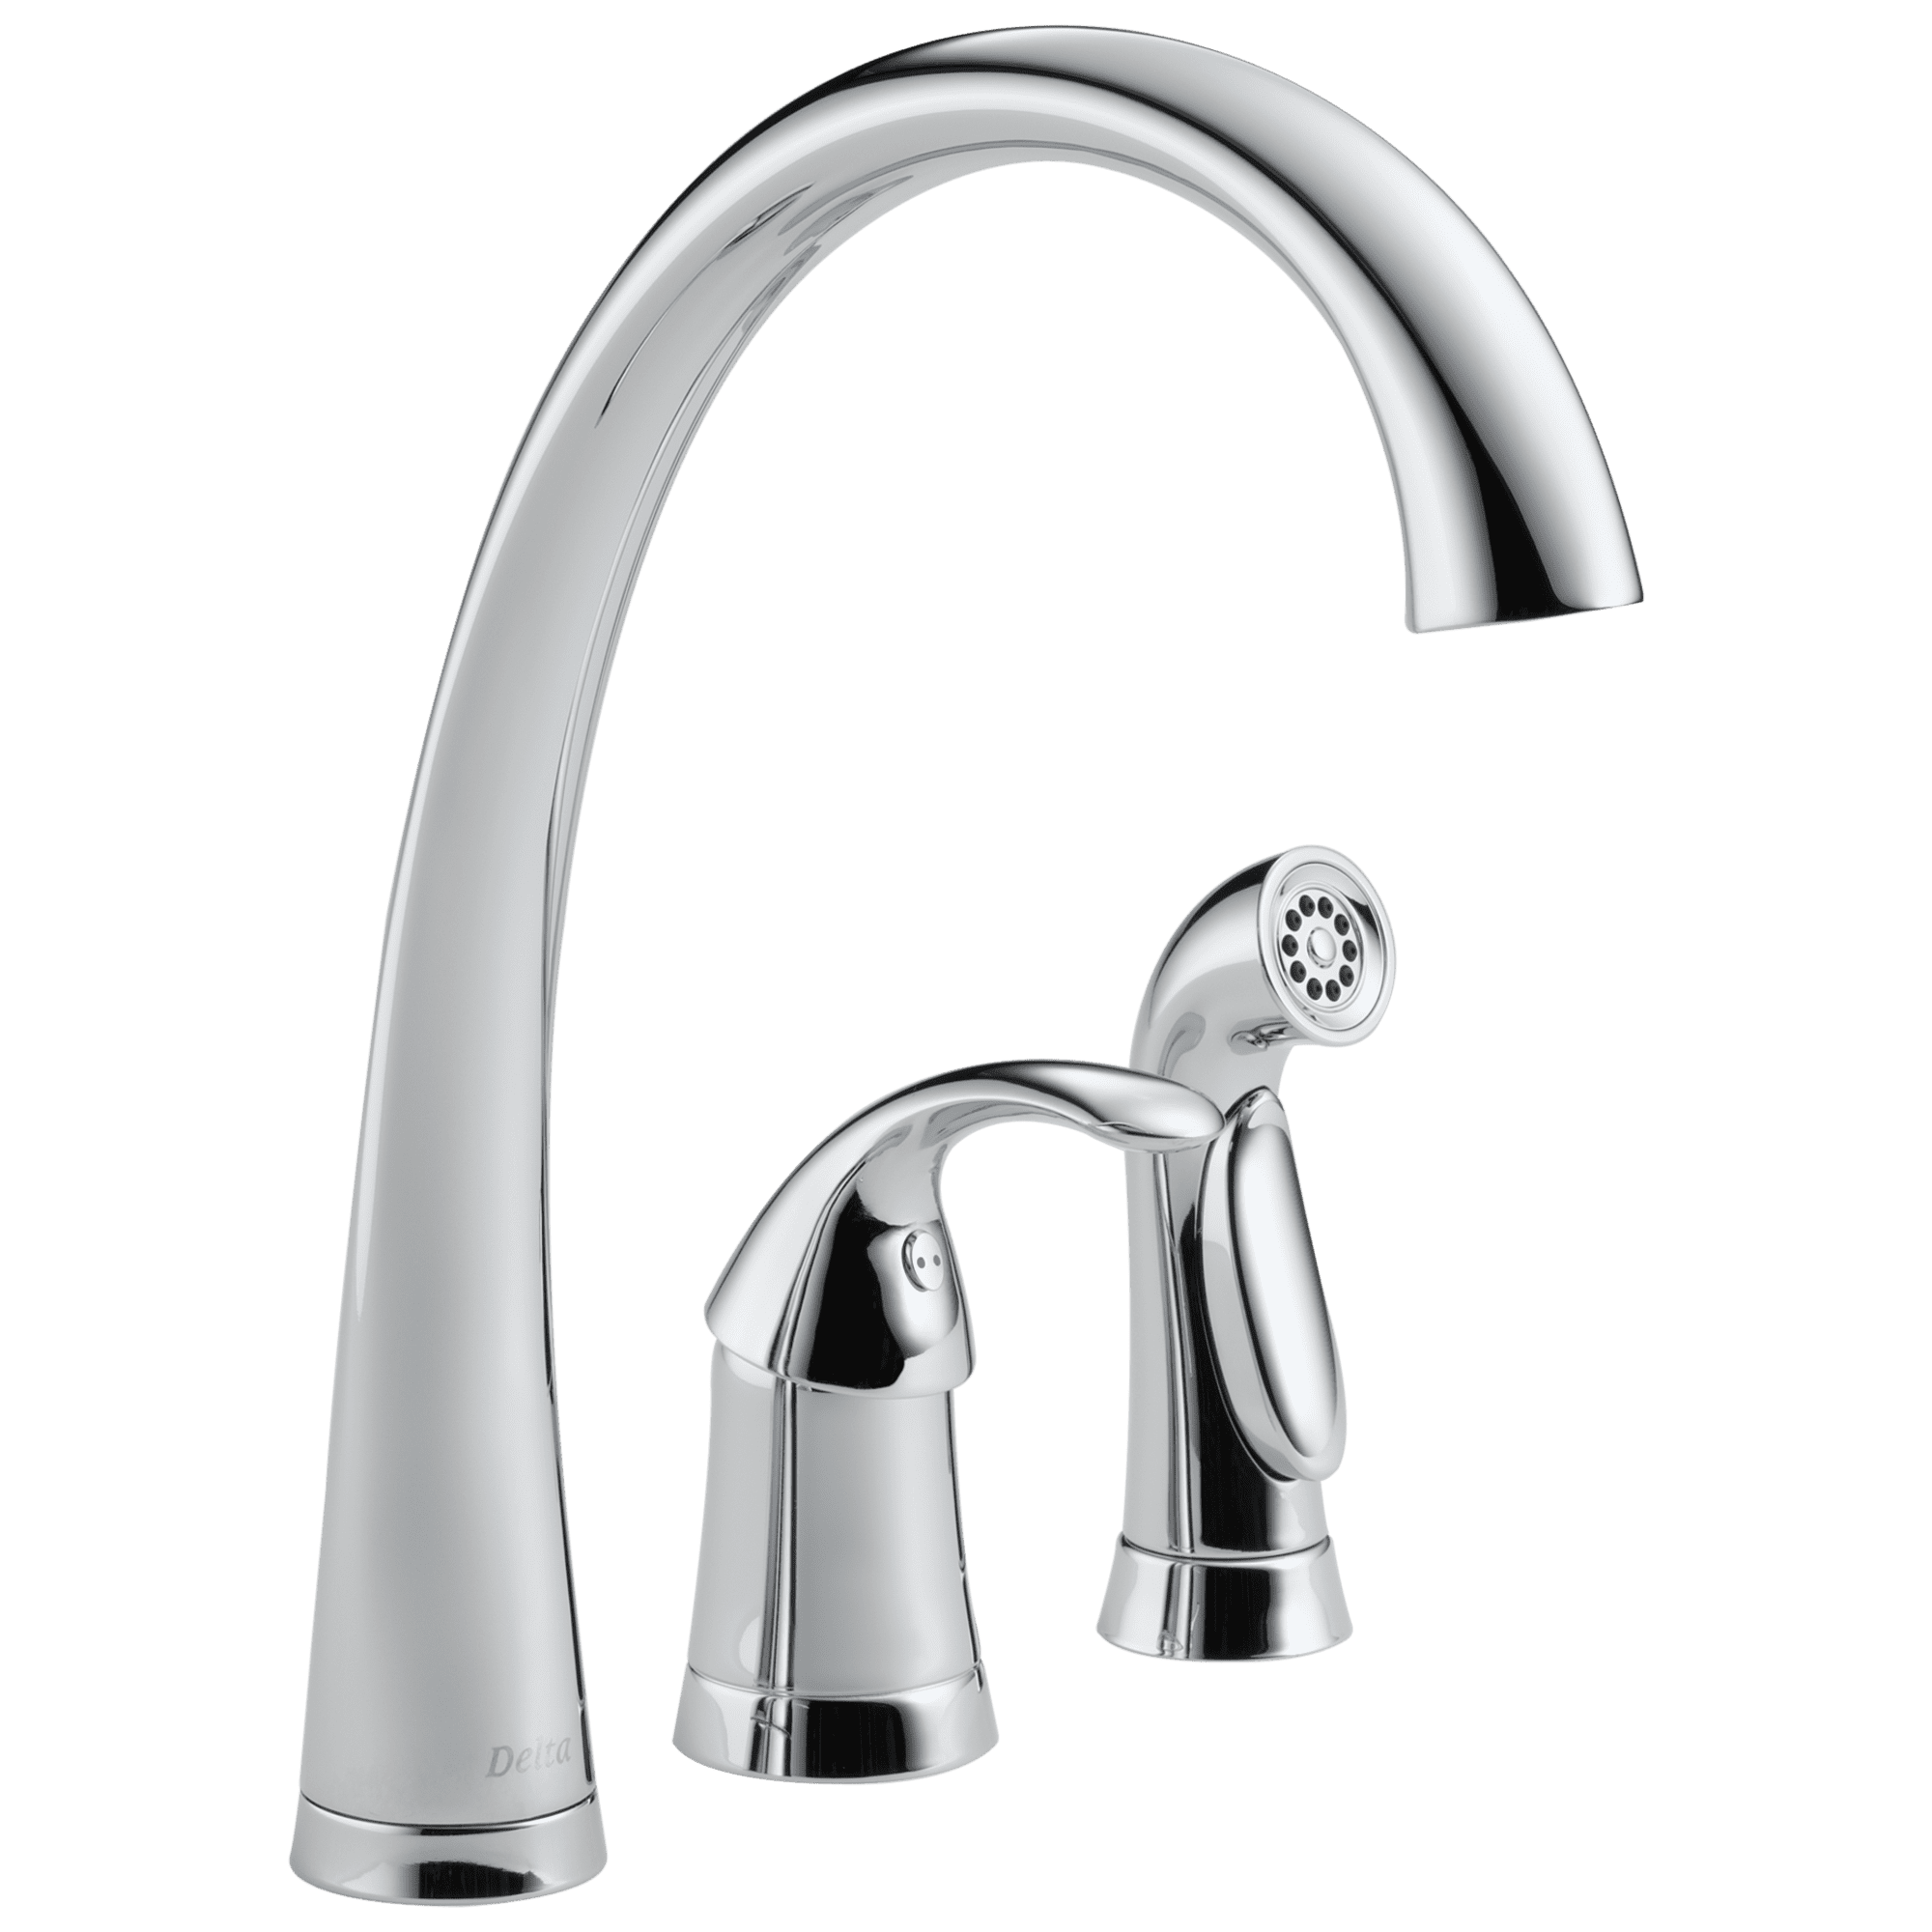 Delta Pilar Single Handle Kitchen Faucet with Spray, Chrome